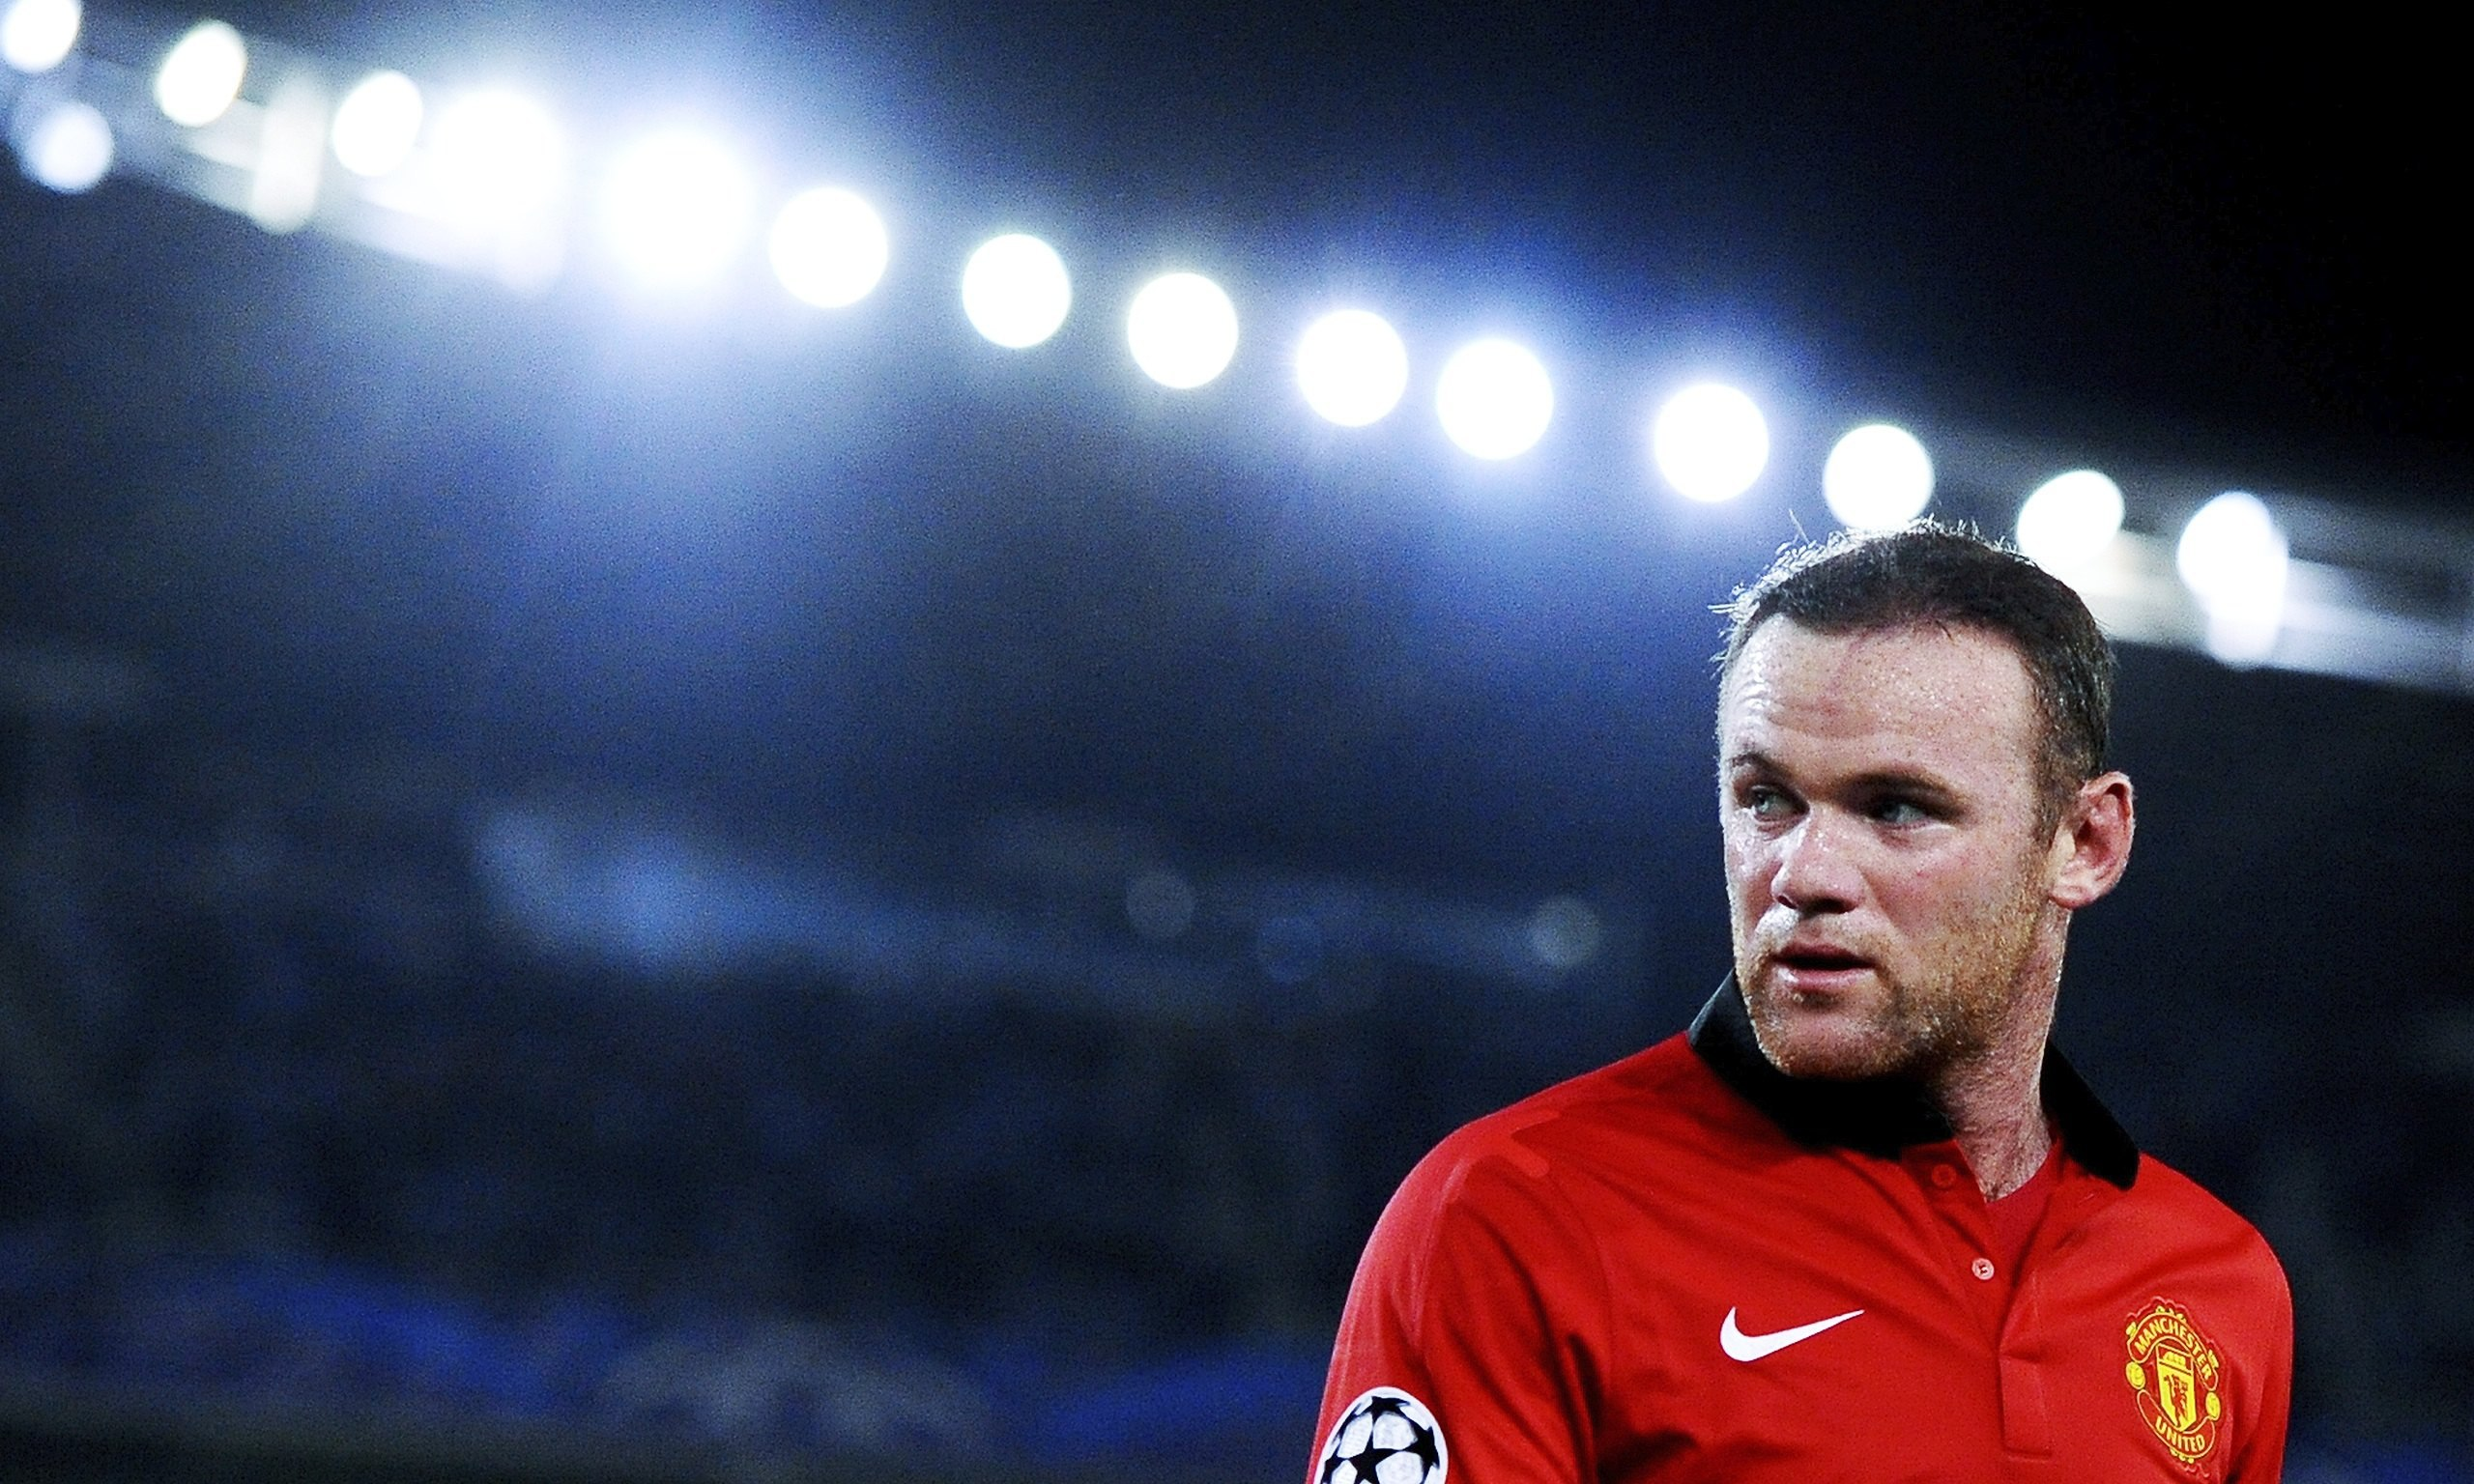 Wayne Rooney Hd Desktop